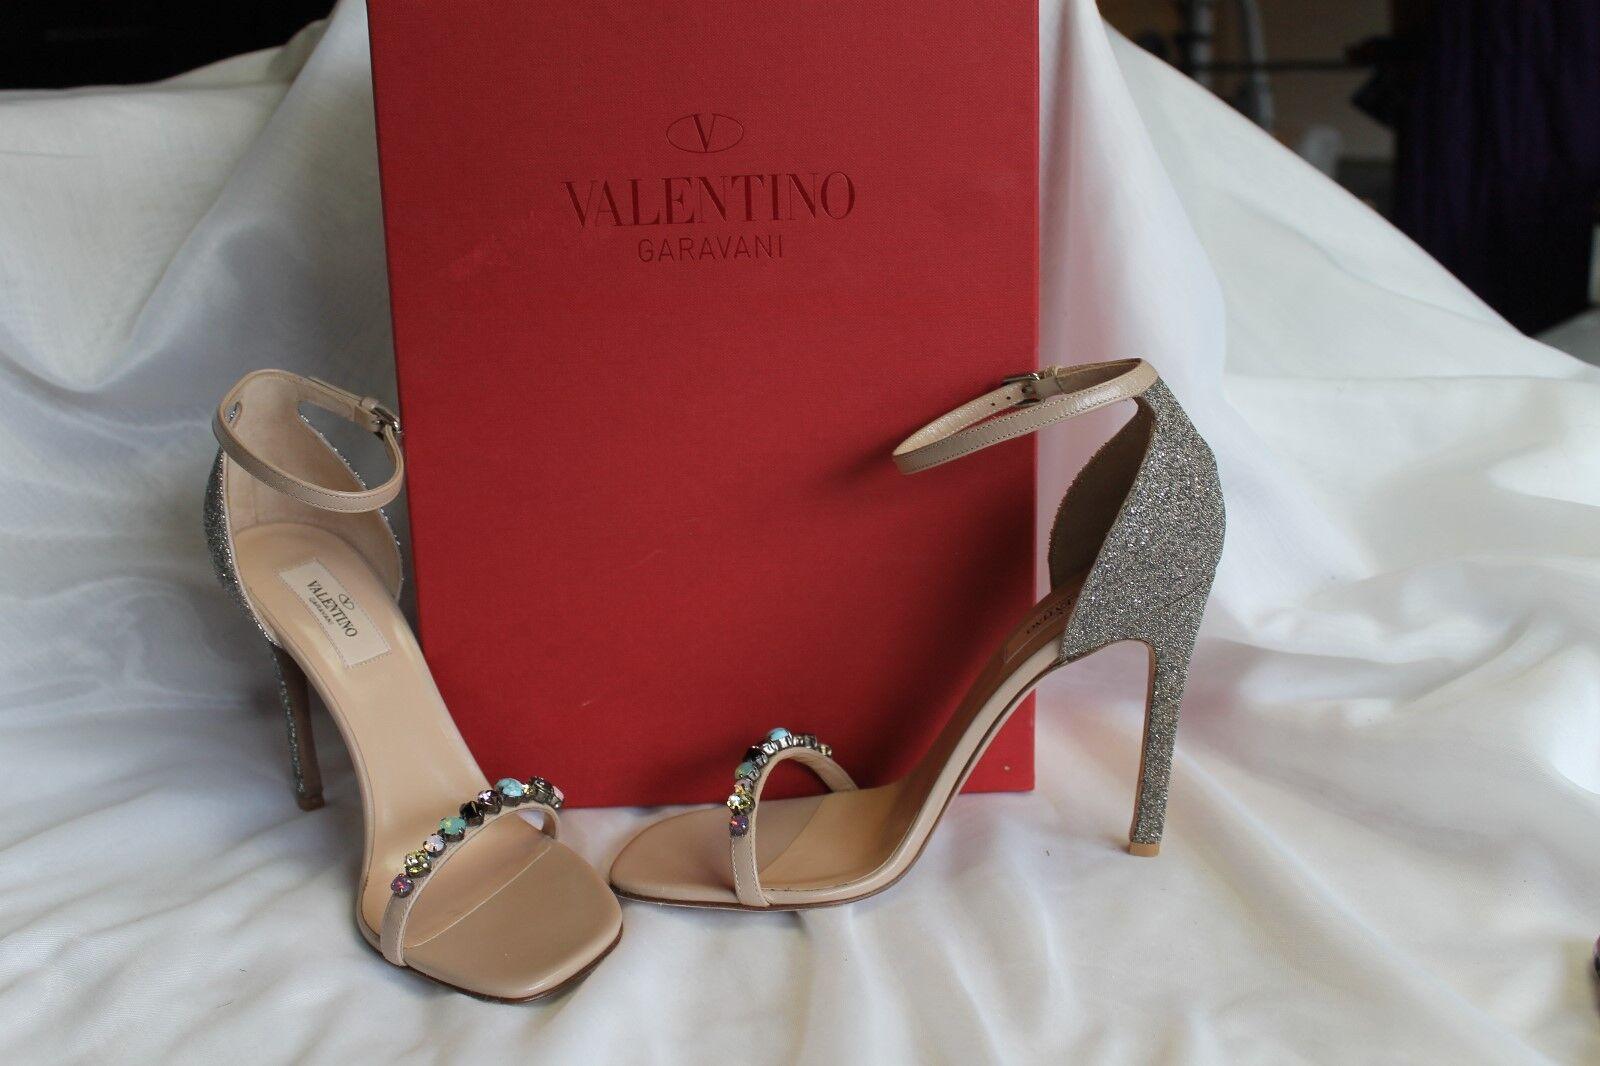 Valentino Emellited  Glitter Nudo Sandal NIB Dimensione 38  outlet